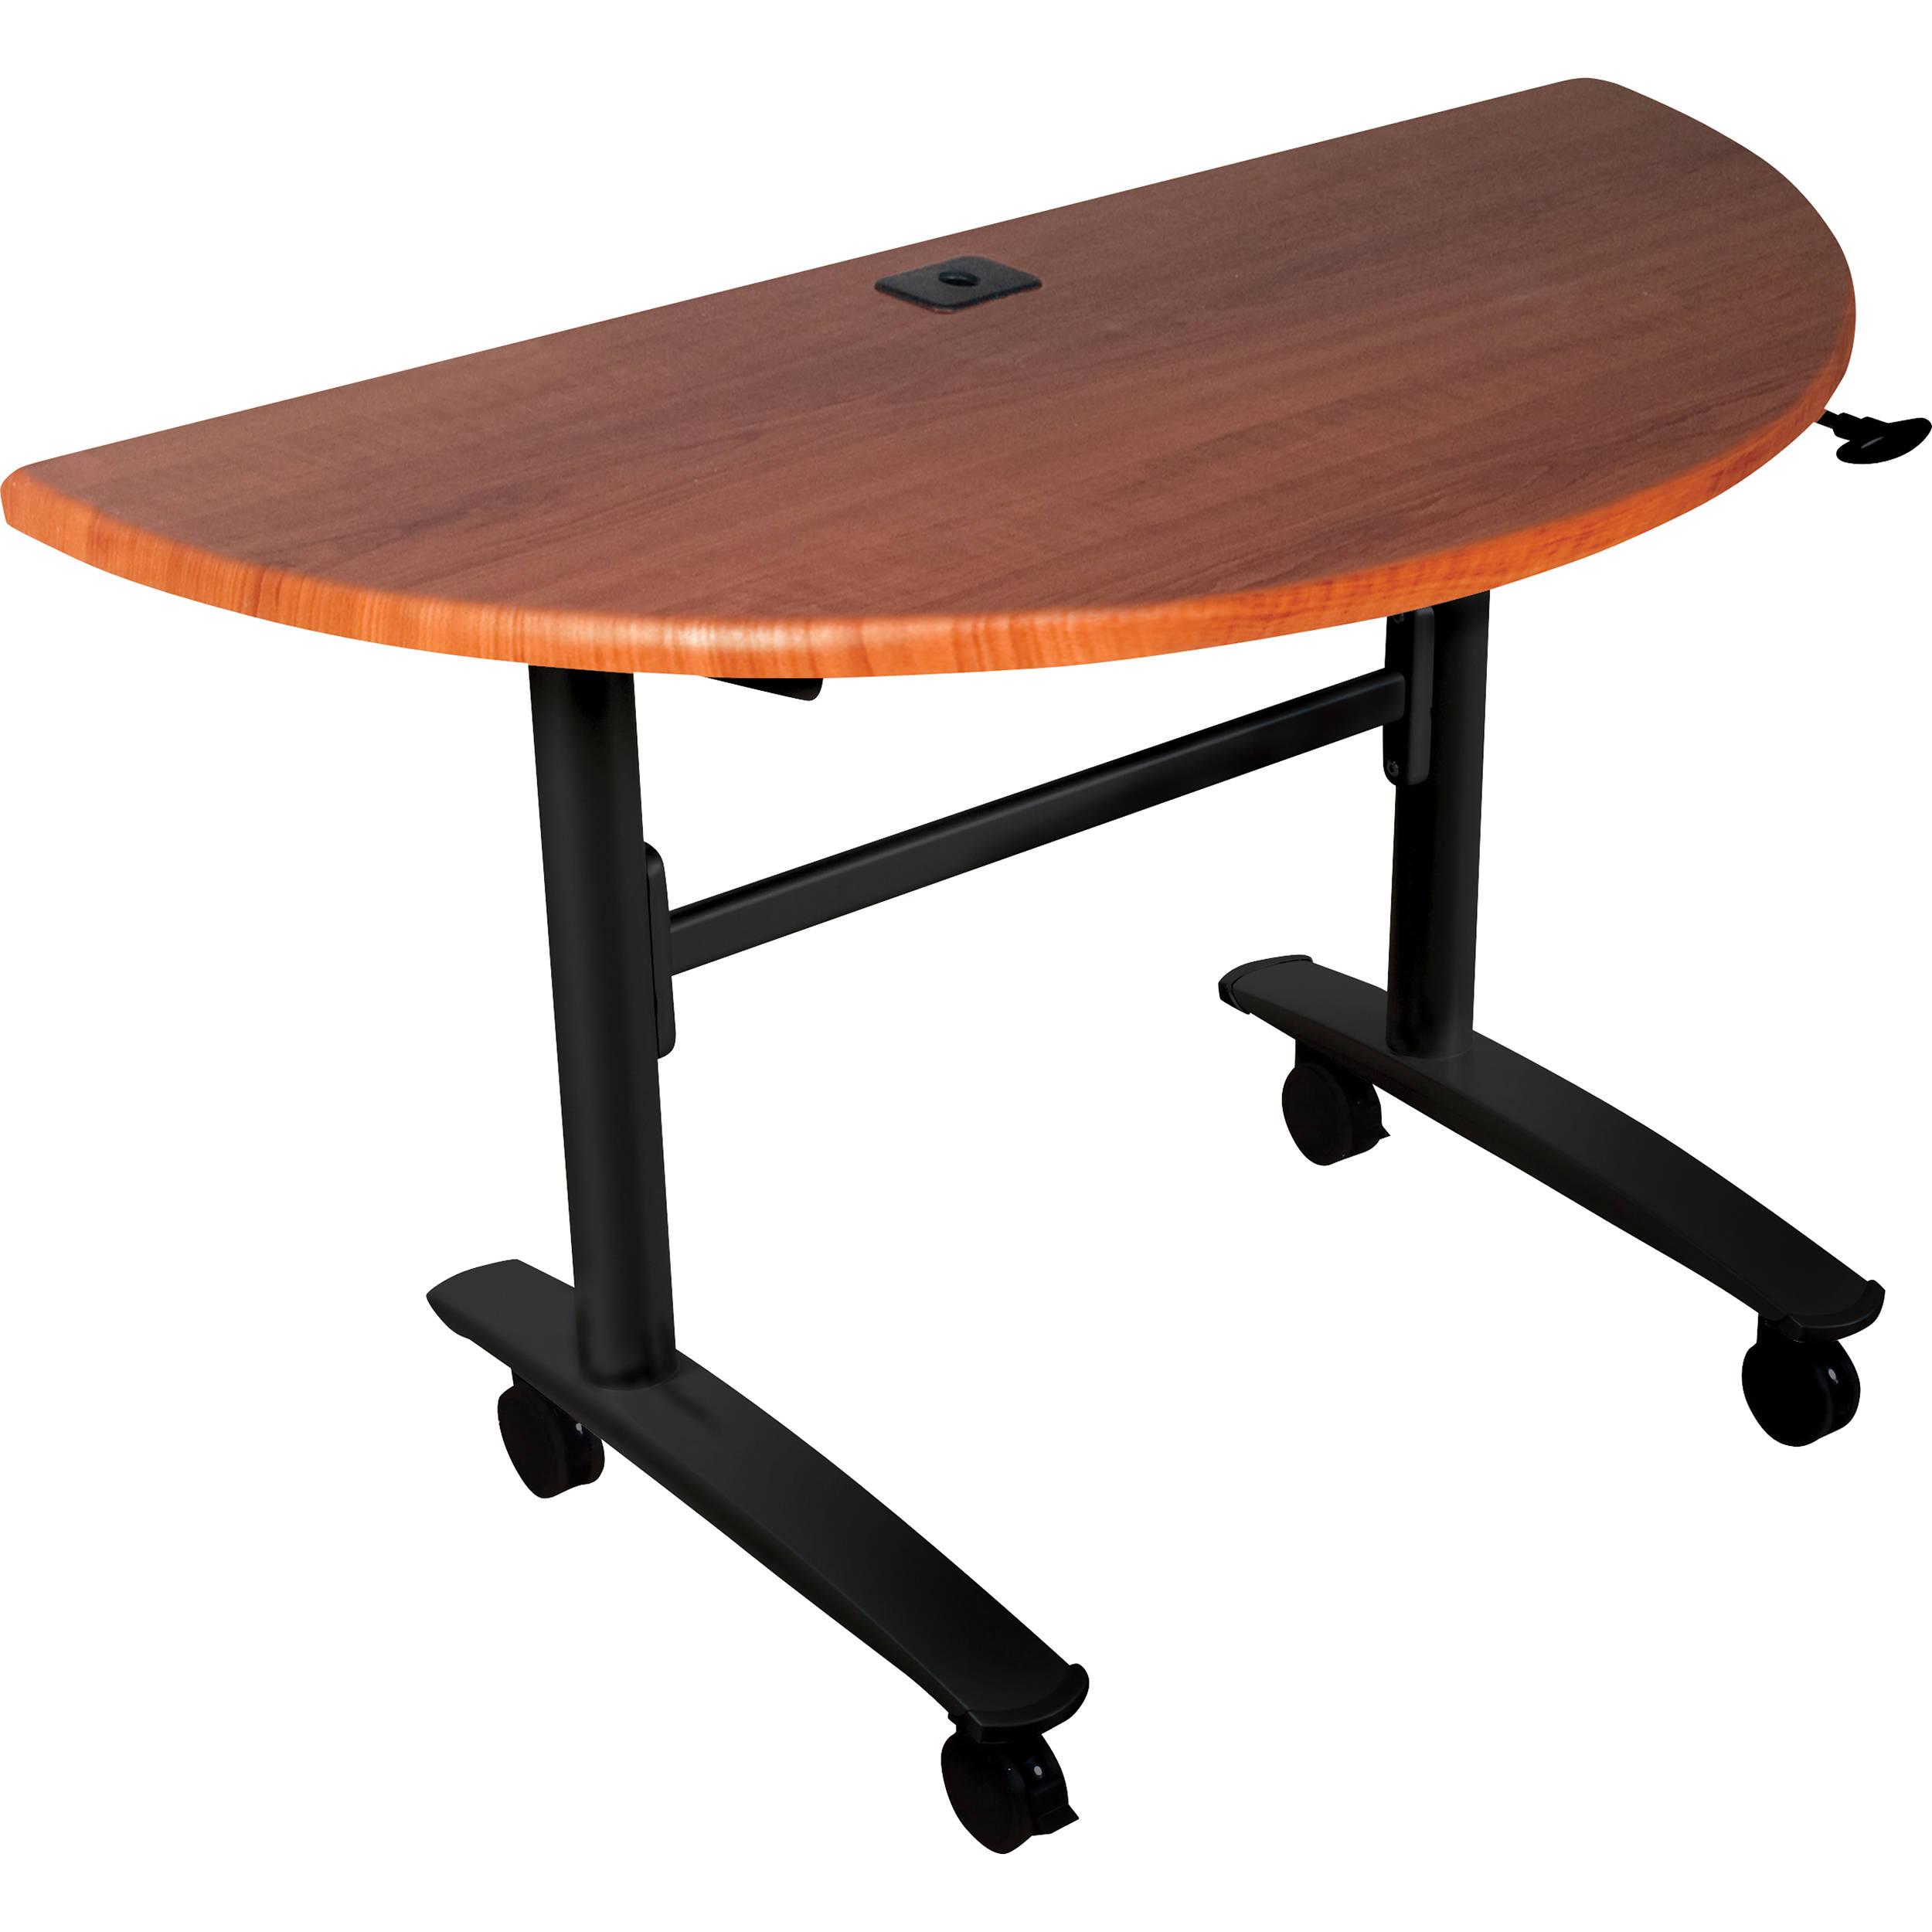 Balt 89999 Lumina Half Round Table Black Cherry 89999m B H